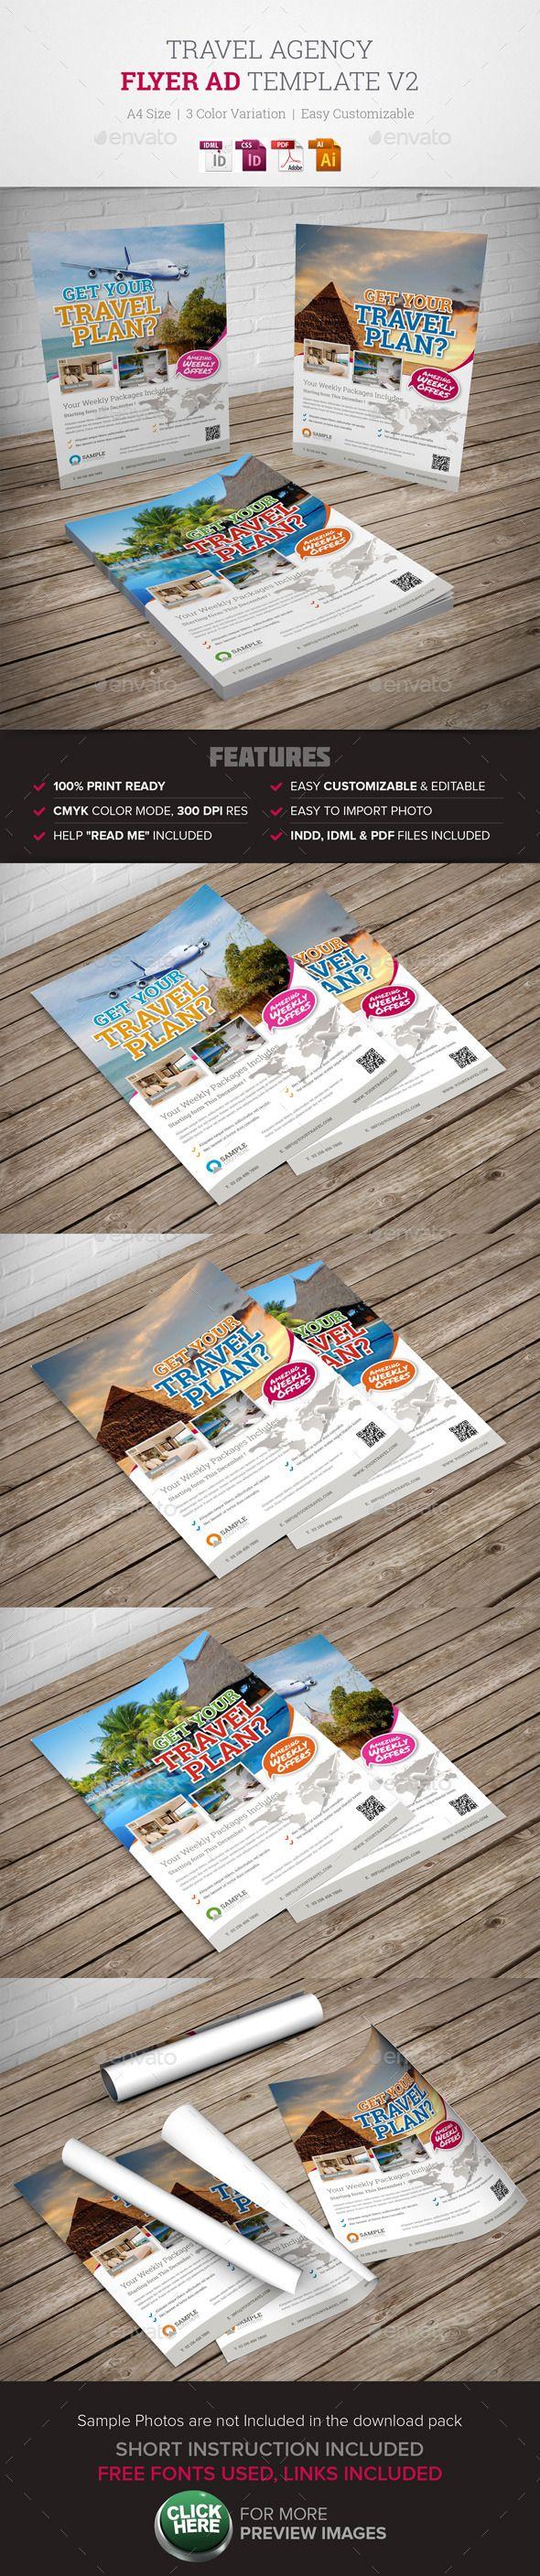 Travel agency flyer ad